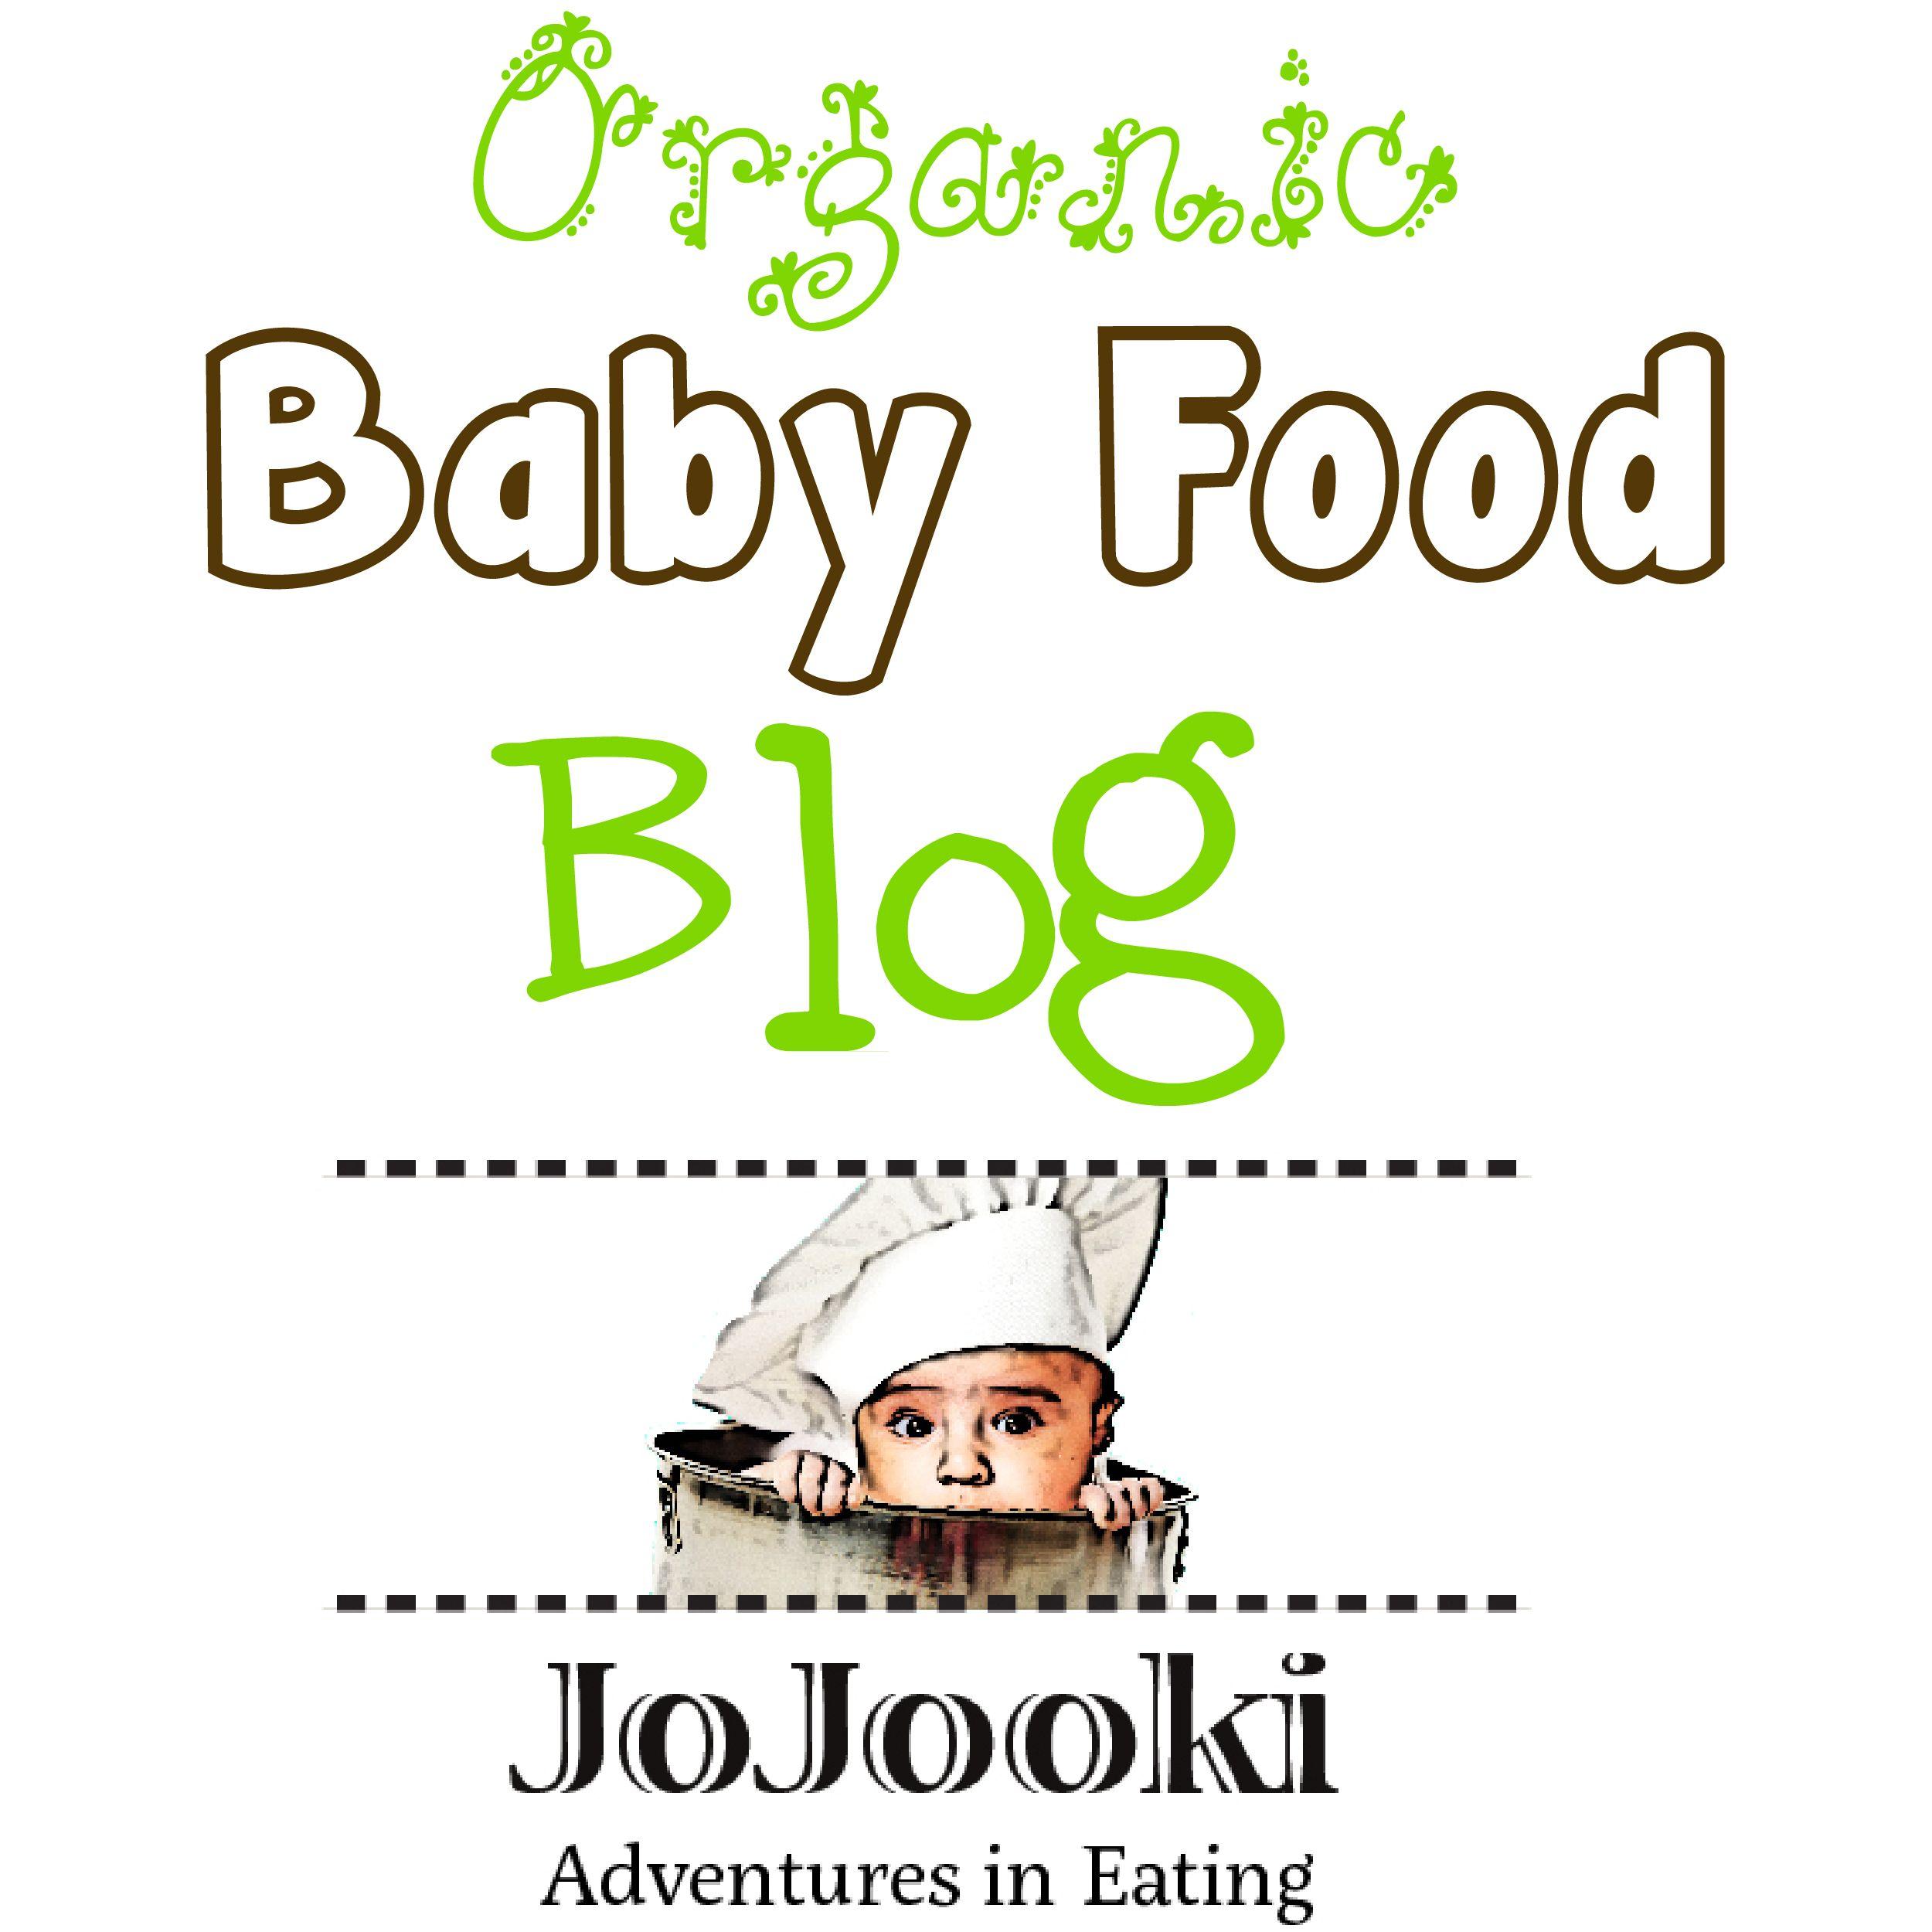 A whole blog dedicated to organic homemade baby food!